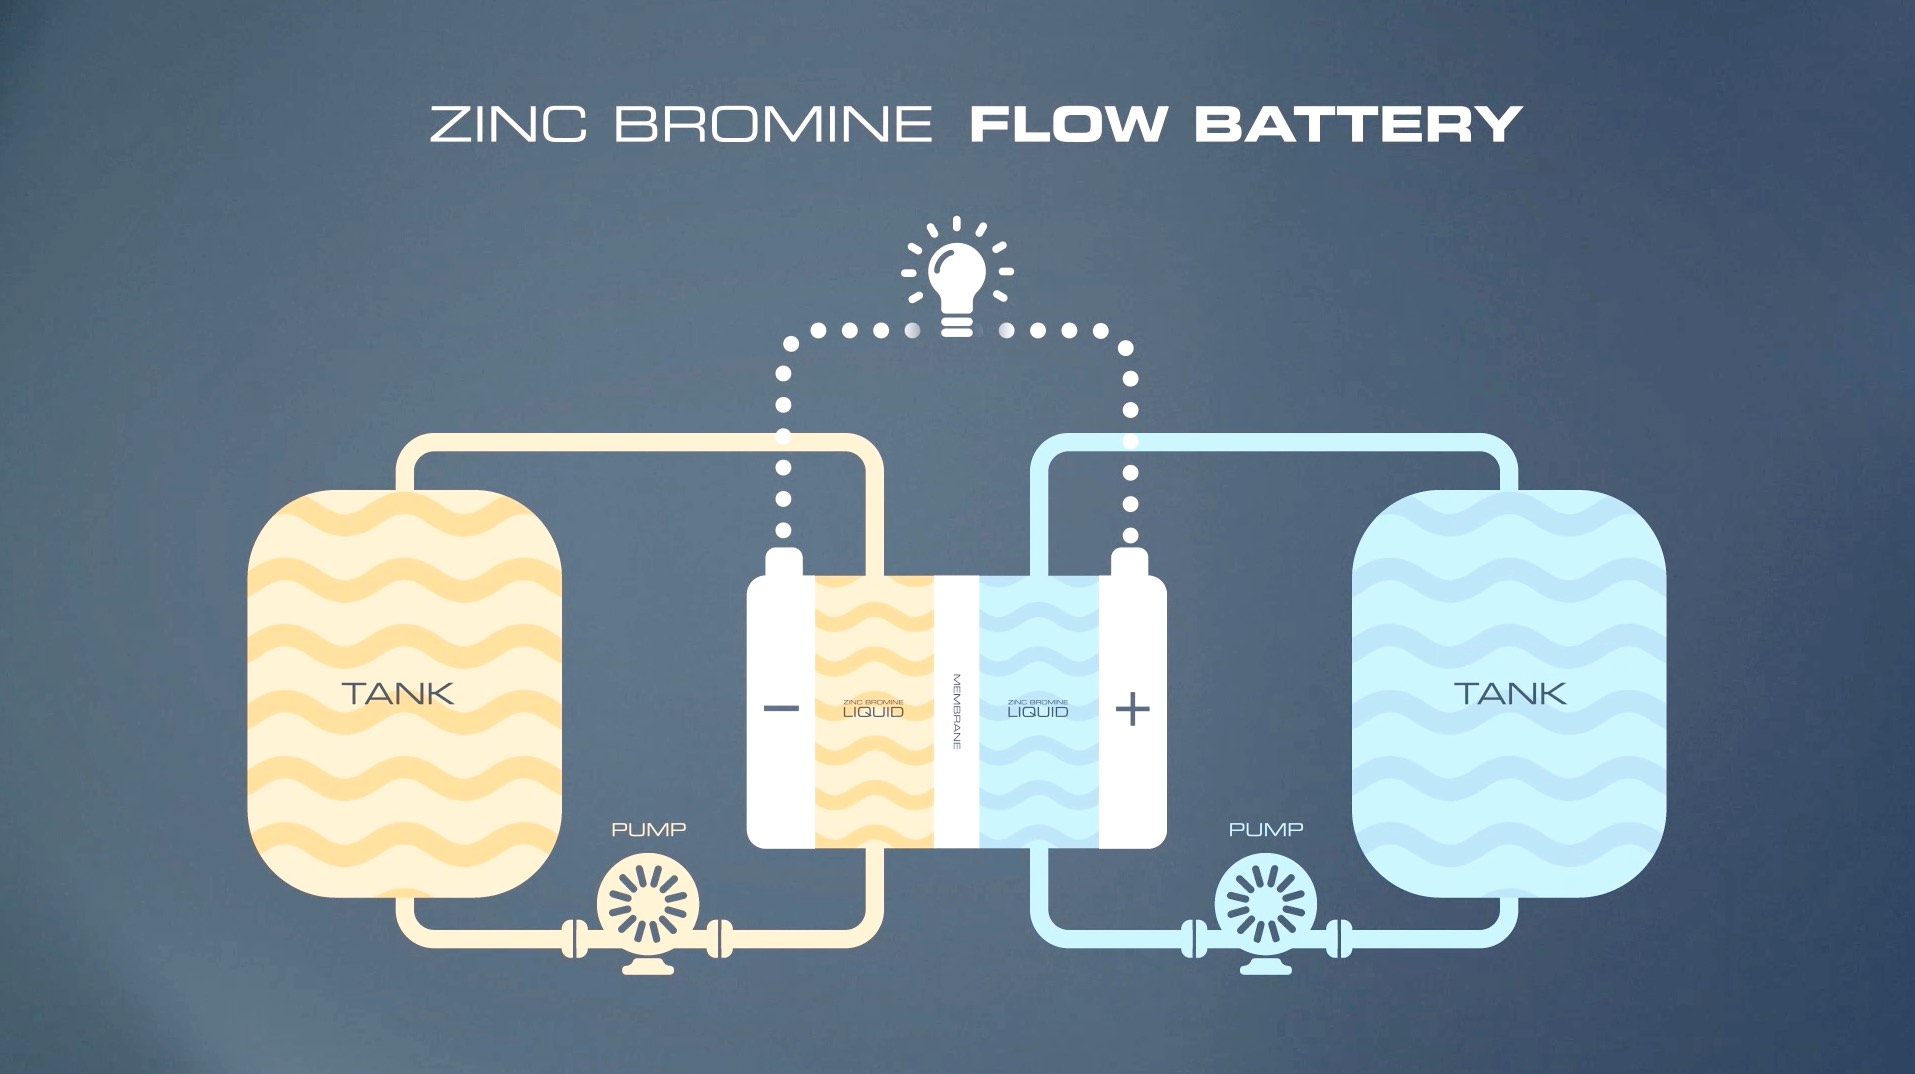 Zinc Bromine Flow Battery Graphic